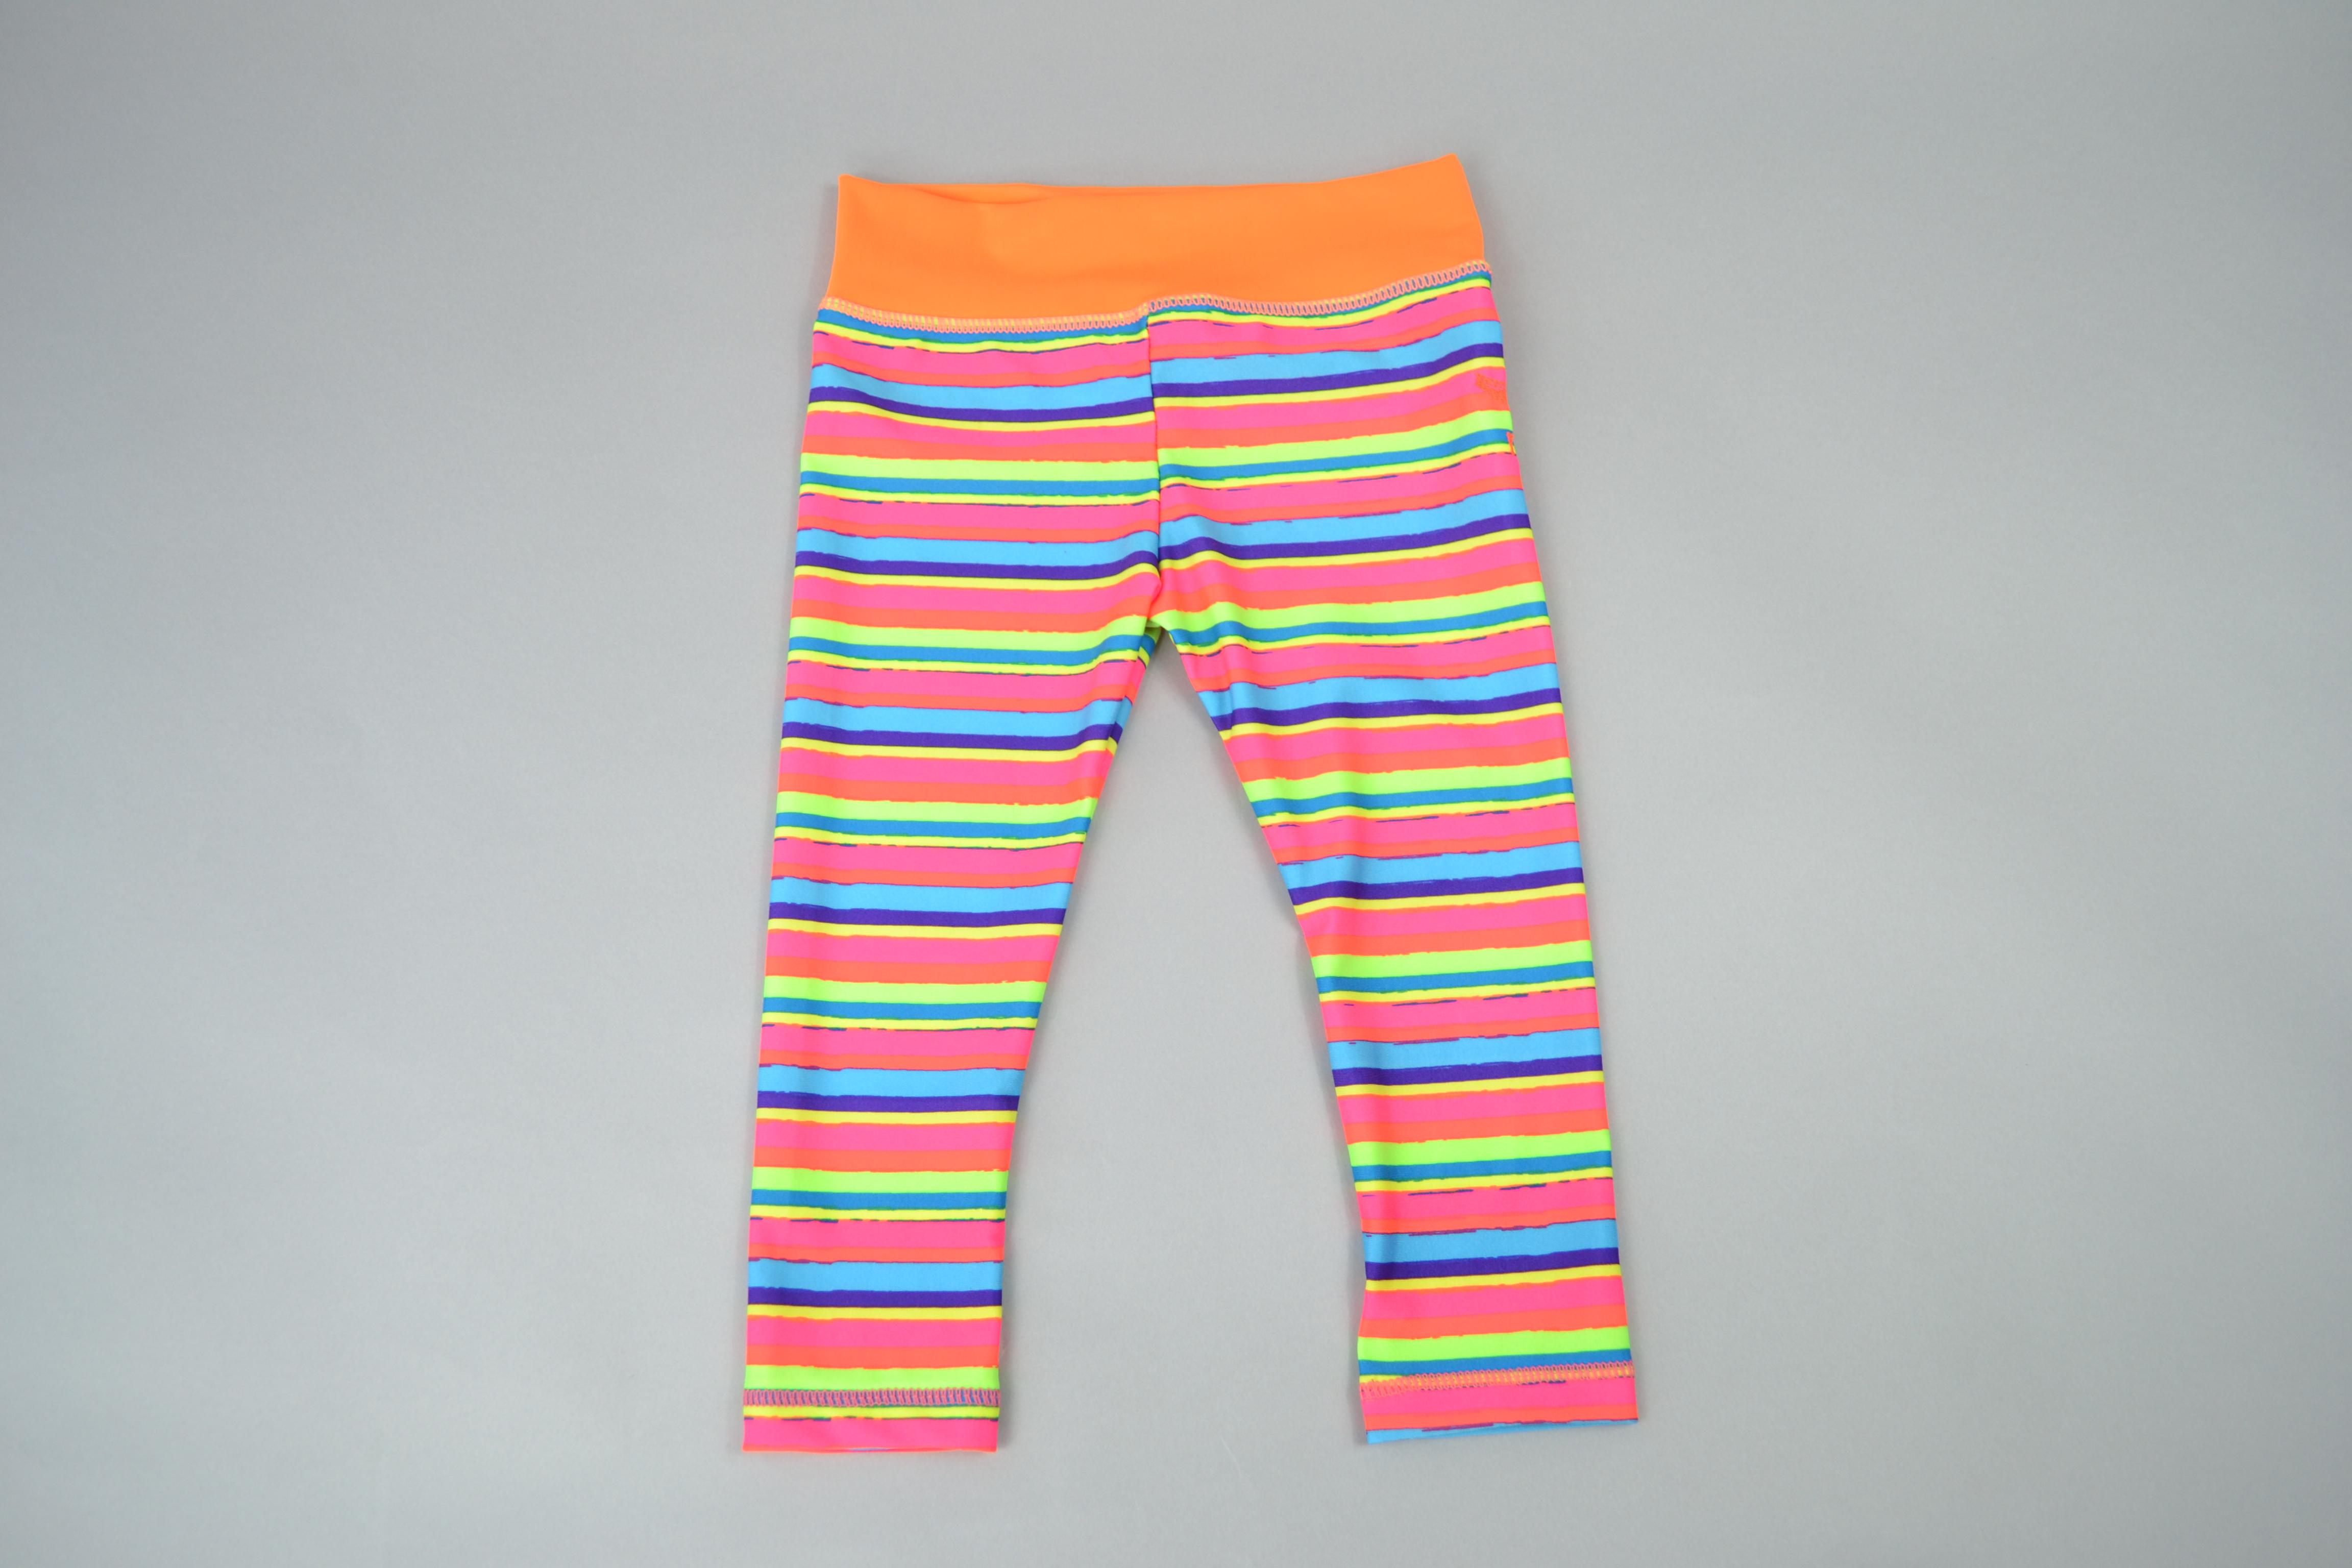 Kids Yoga Leggings - Striped